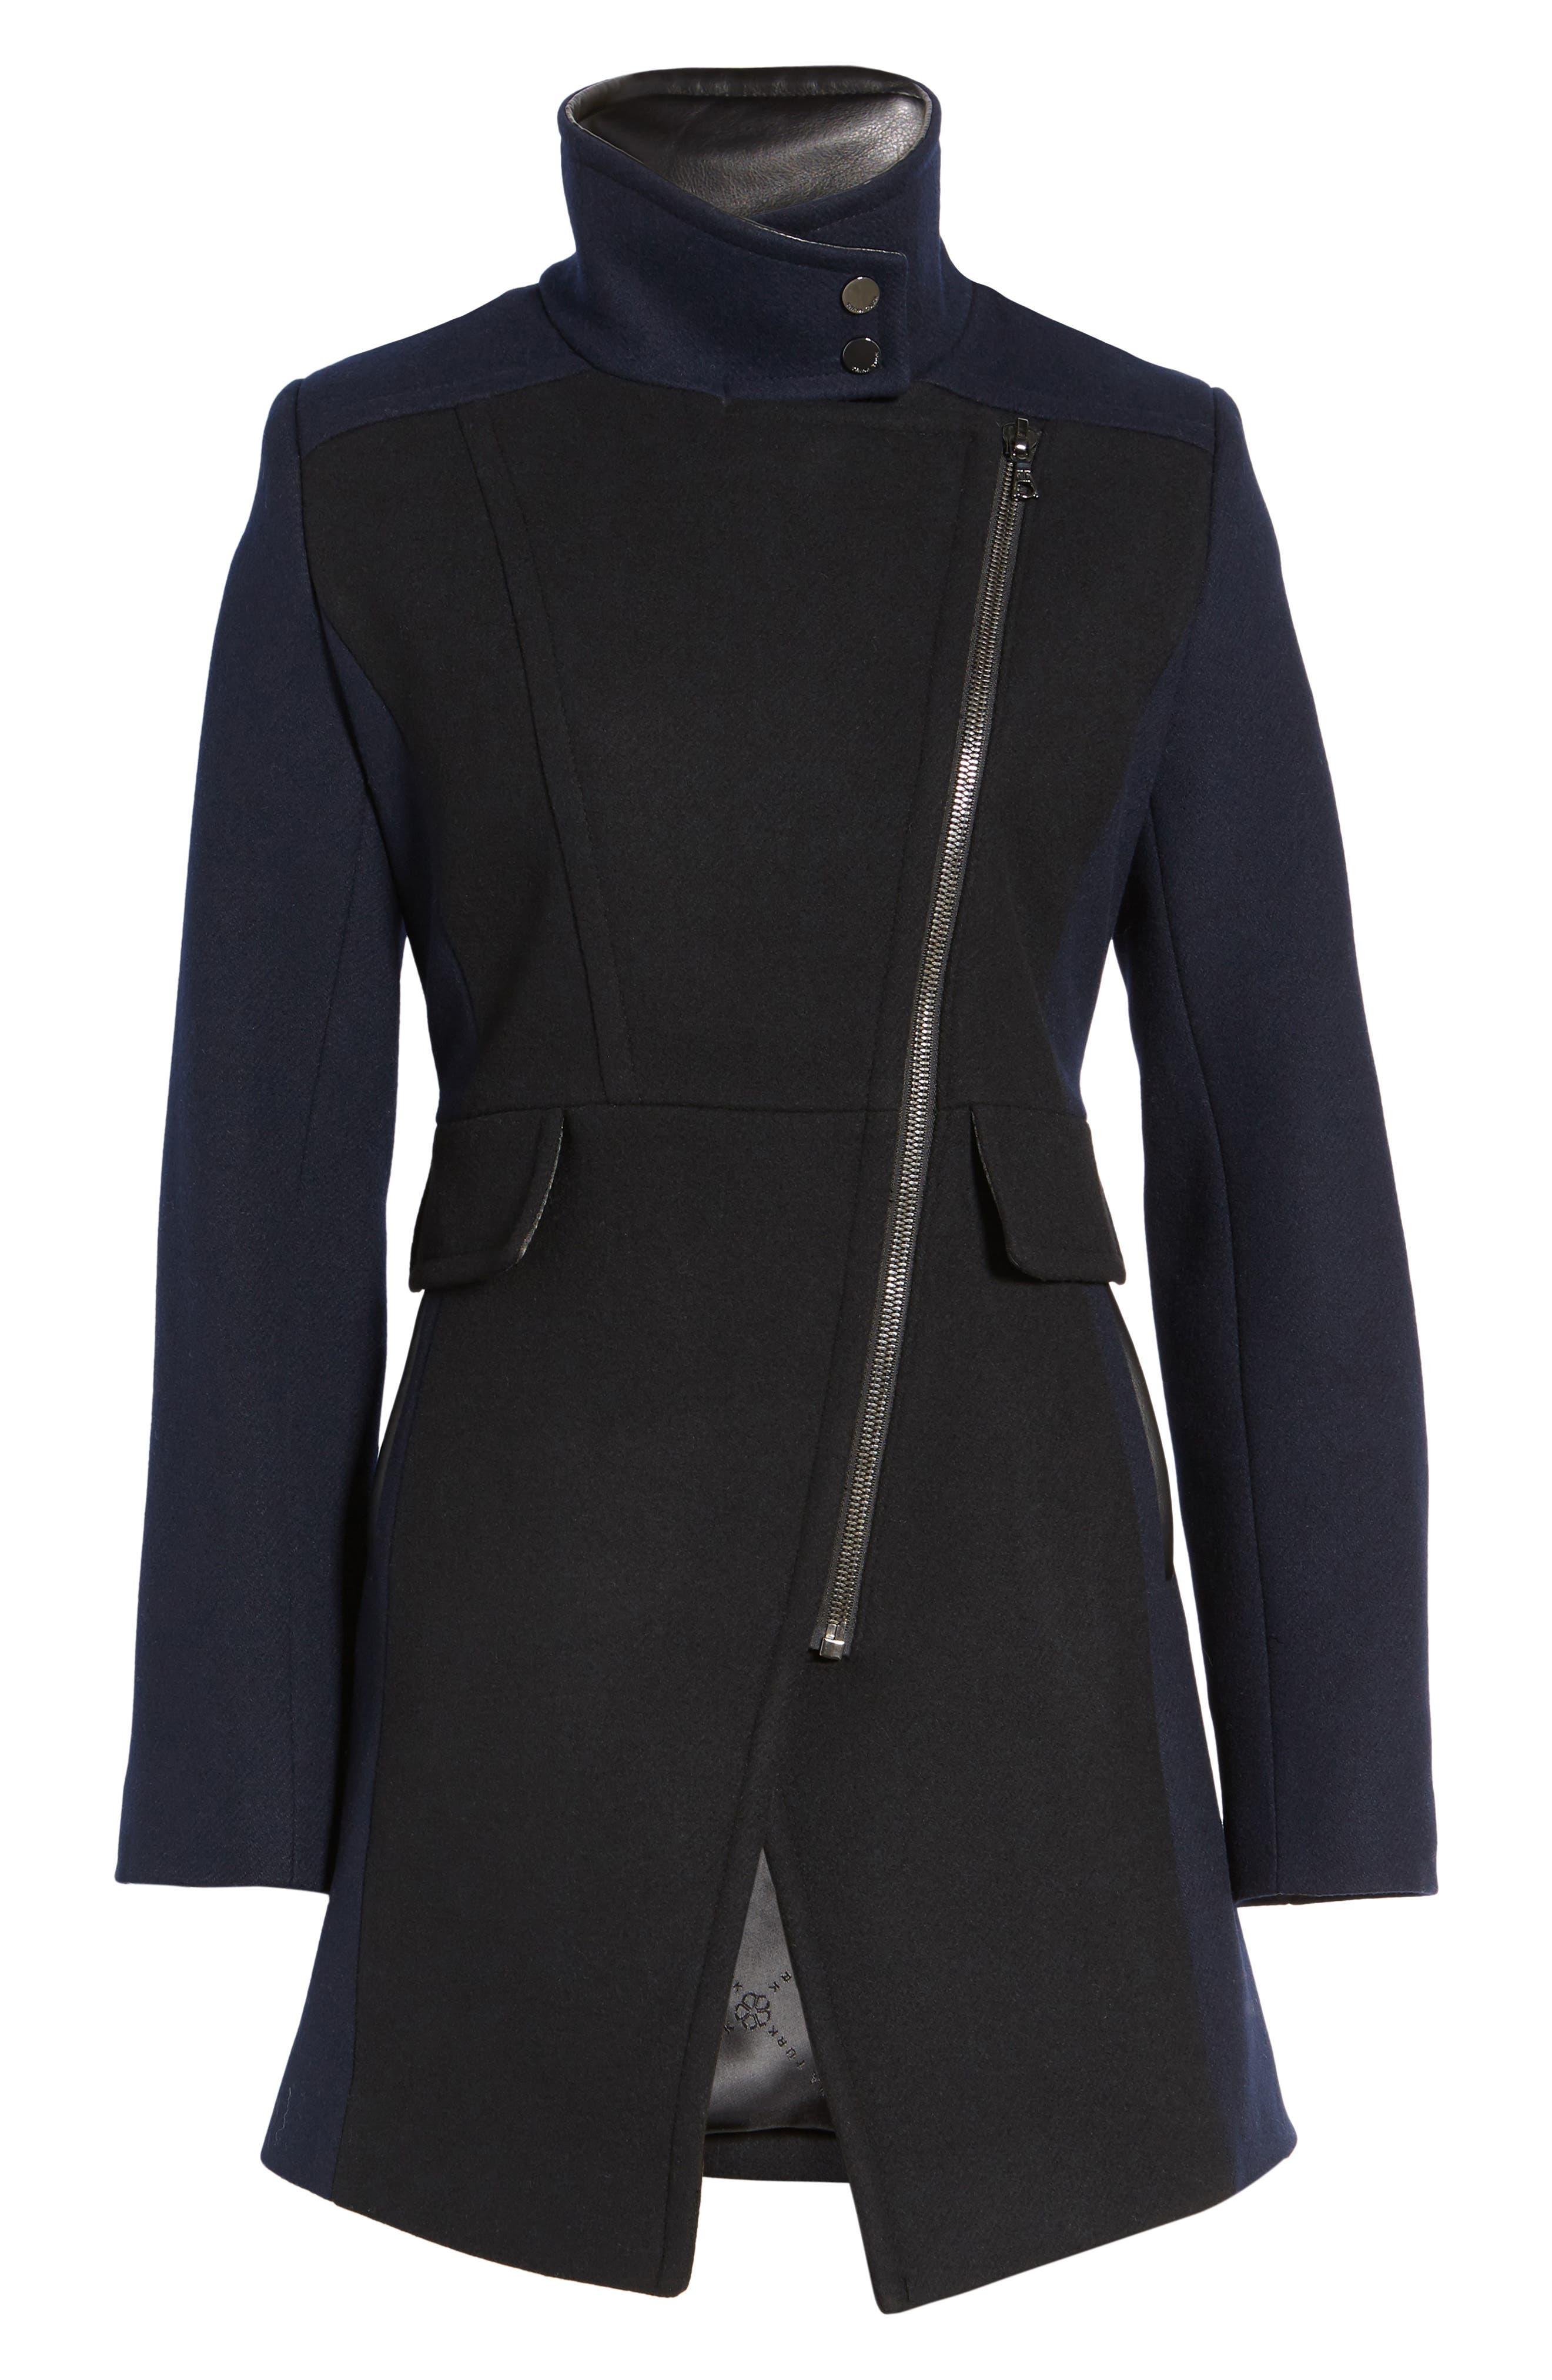 Eleanor Leather Trim Wool Blend Coat,                             Alternate thumbnail 5, color,                             002